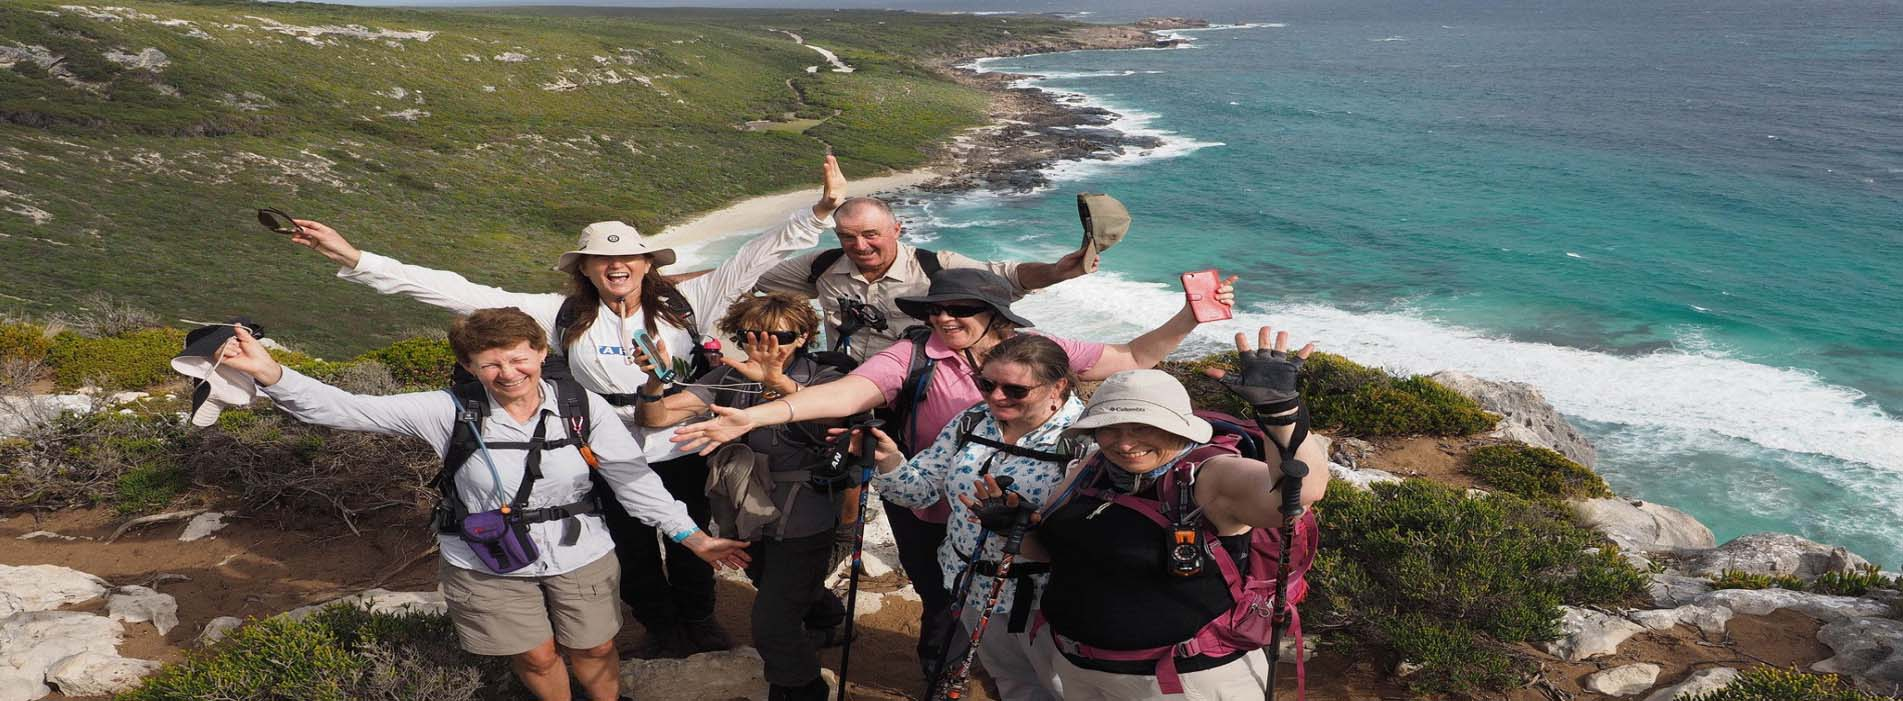 9 DAY WEST AUSTRALIA adventure walking tour